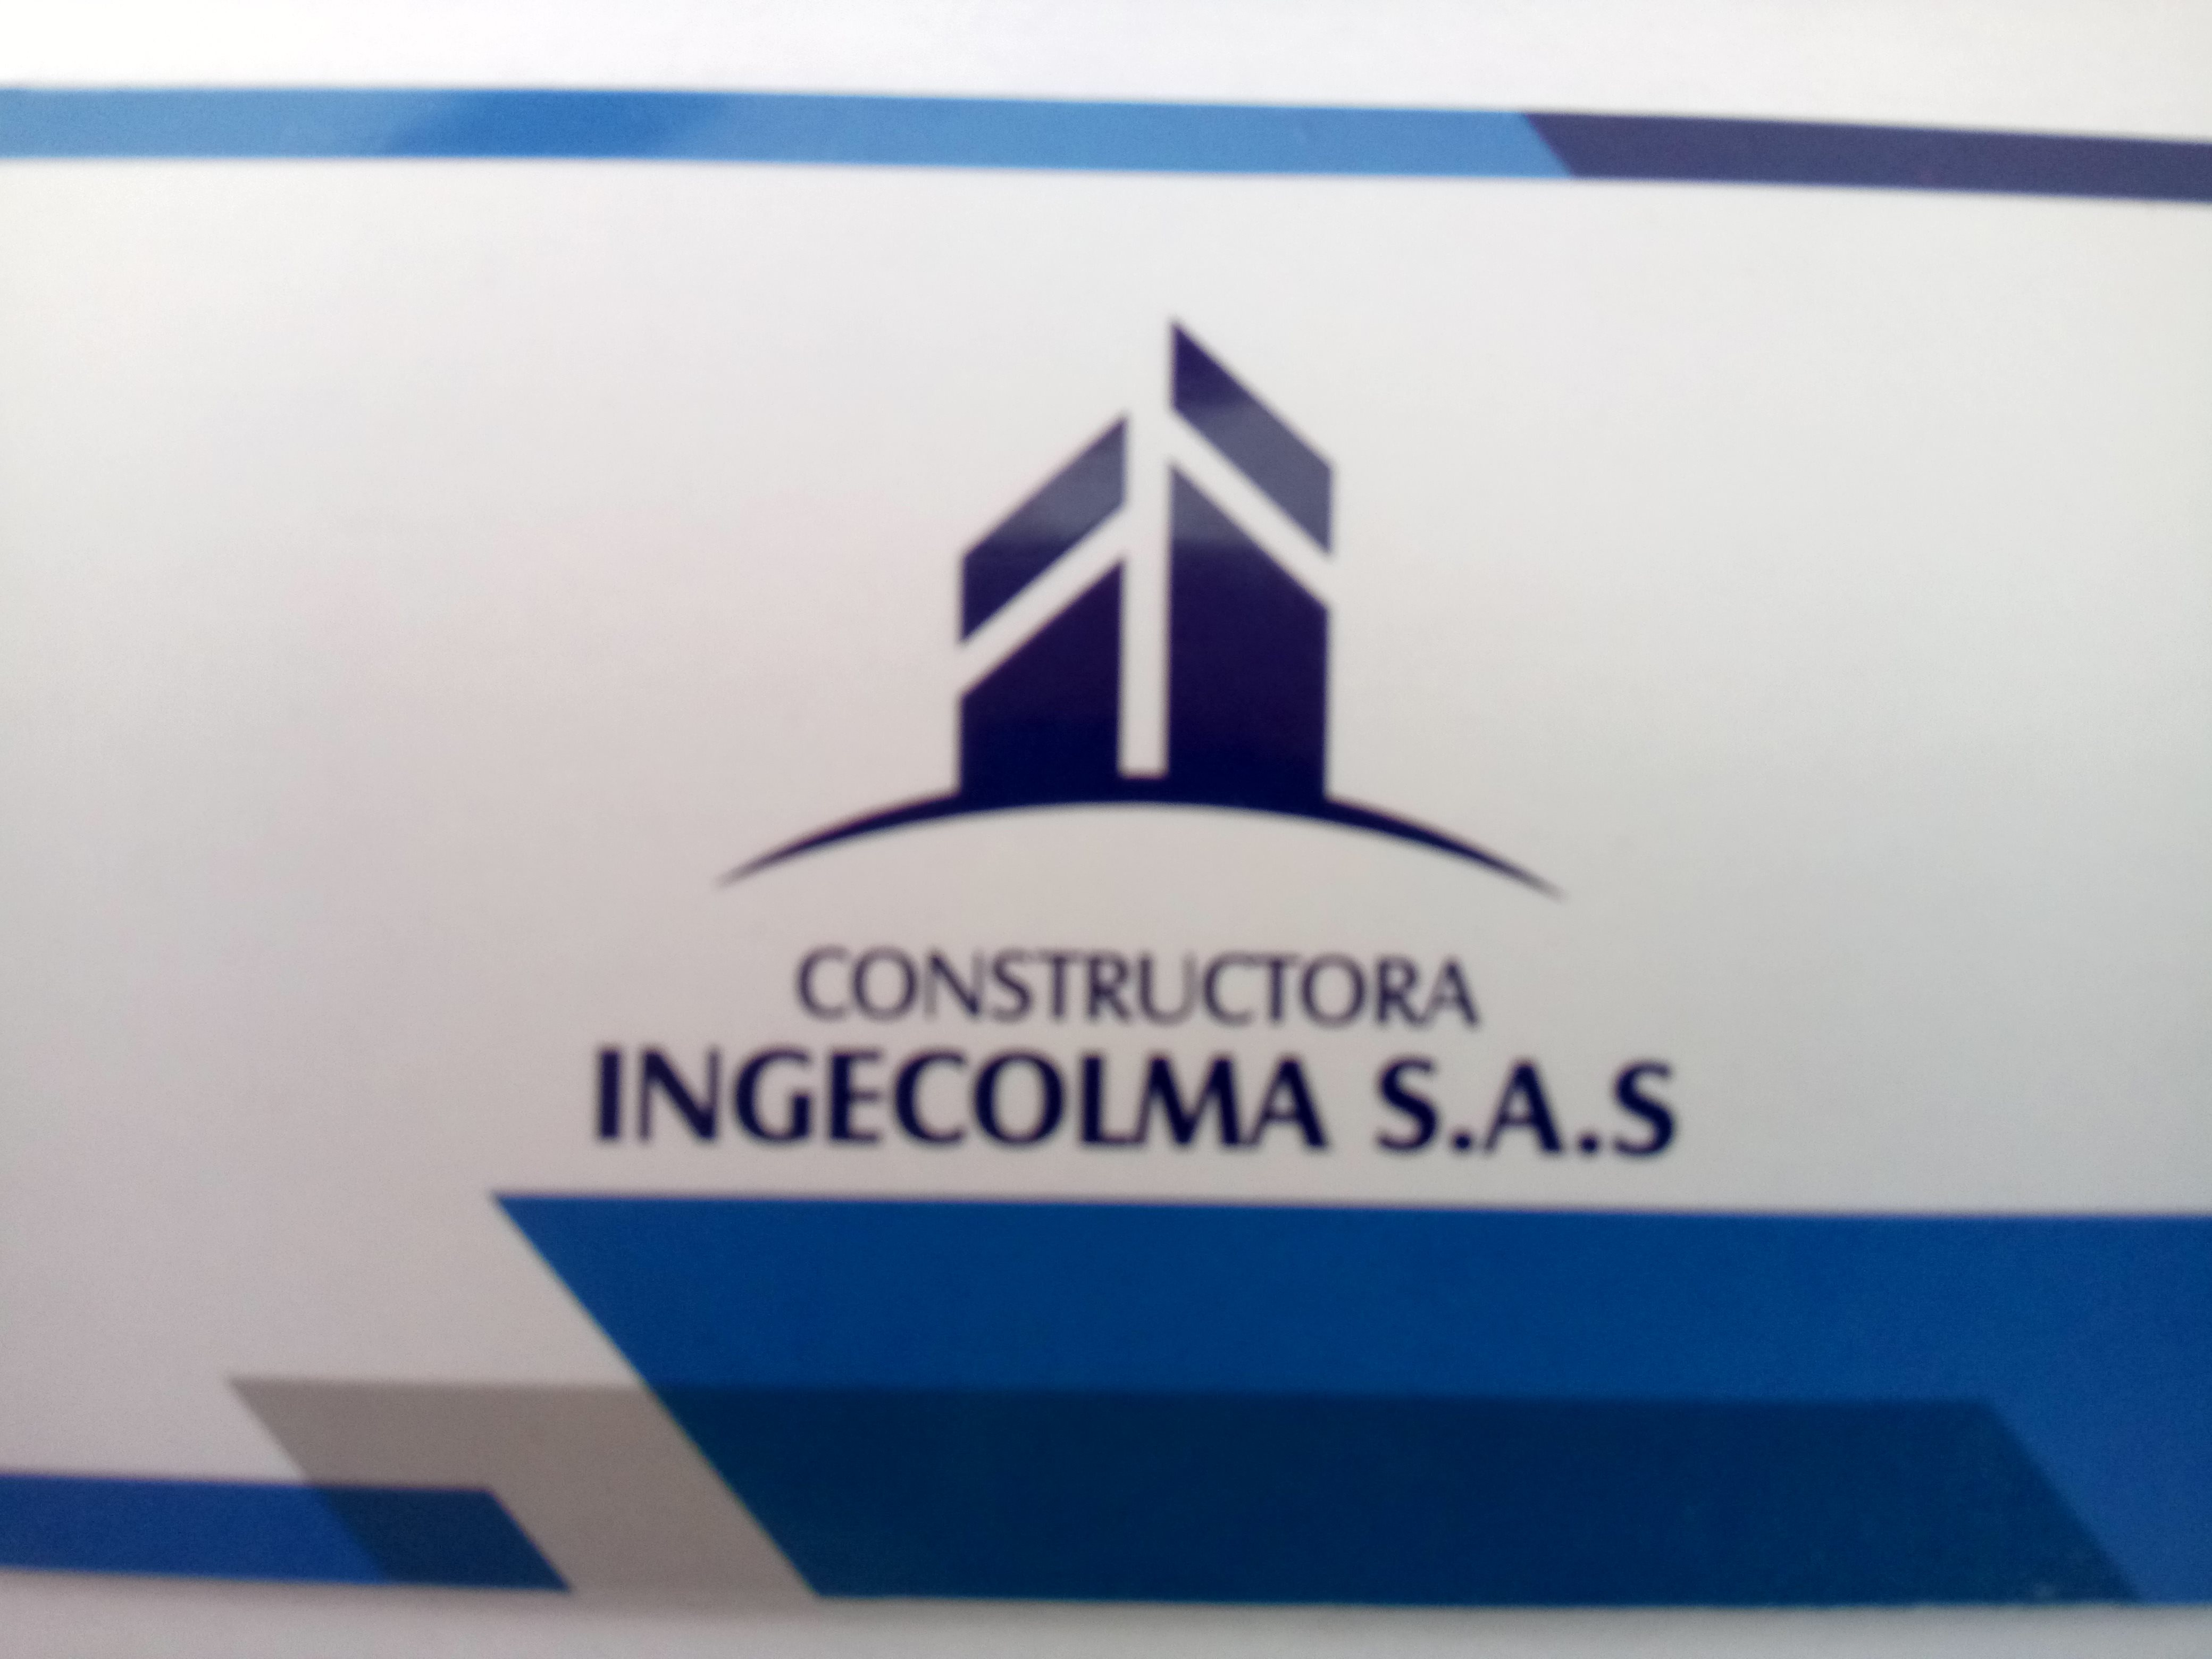 INGECOLMA S.A.S